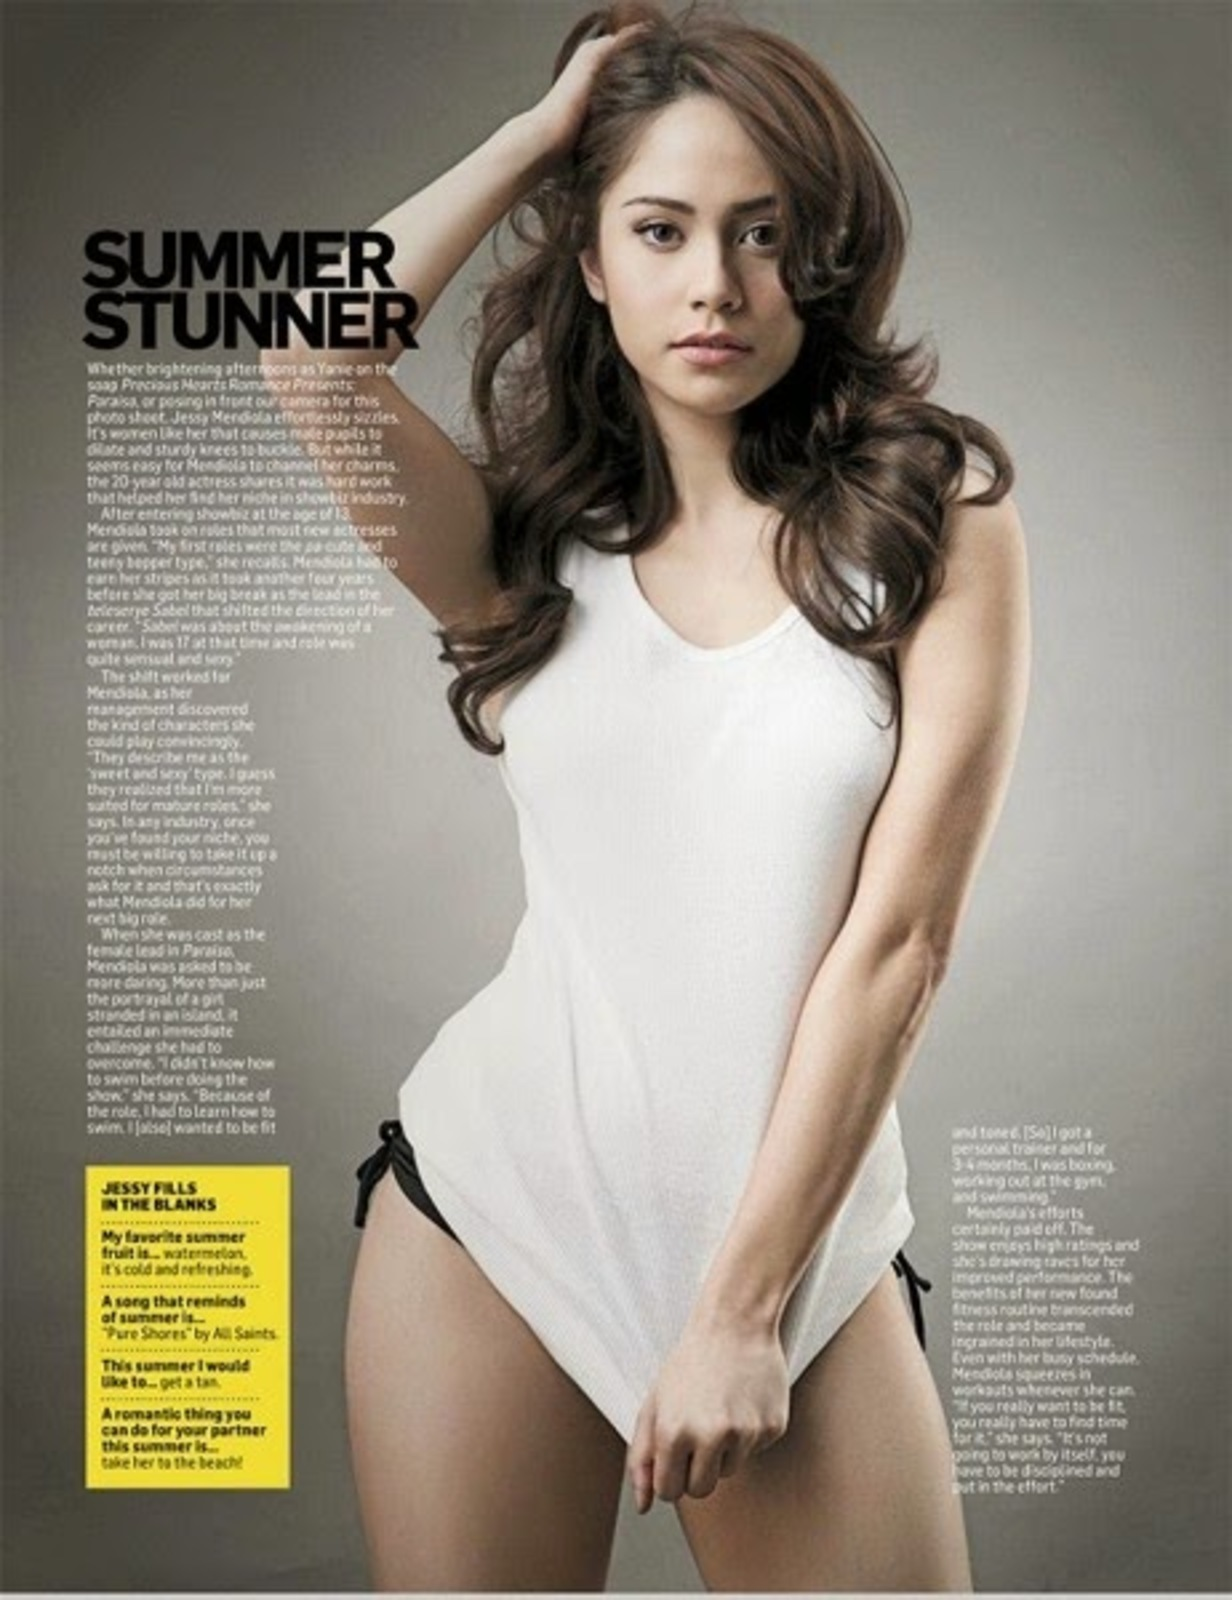 jessy mendiola sexy mens health magazine bikini pics 03